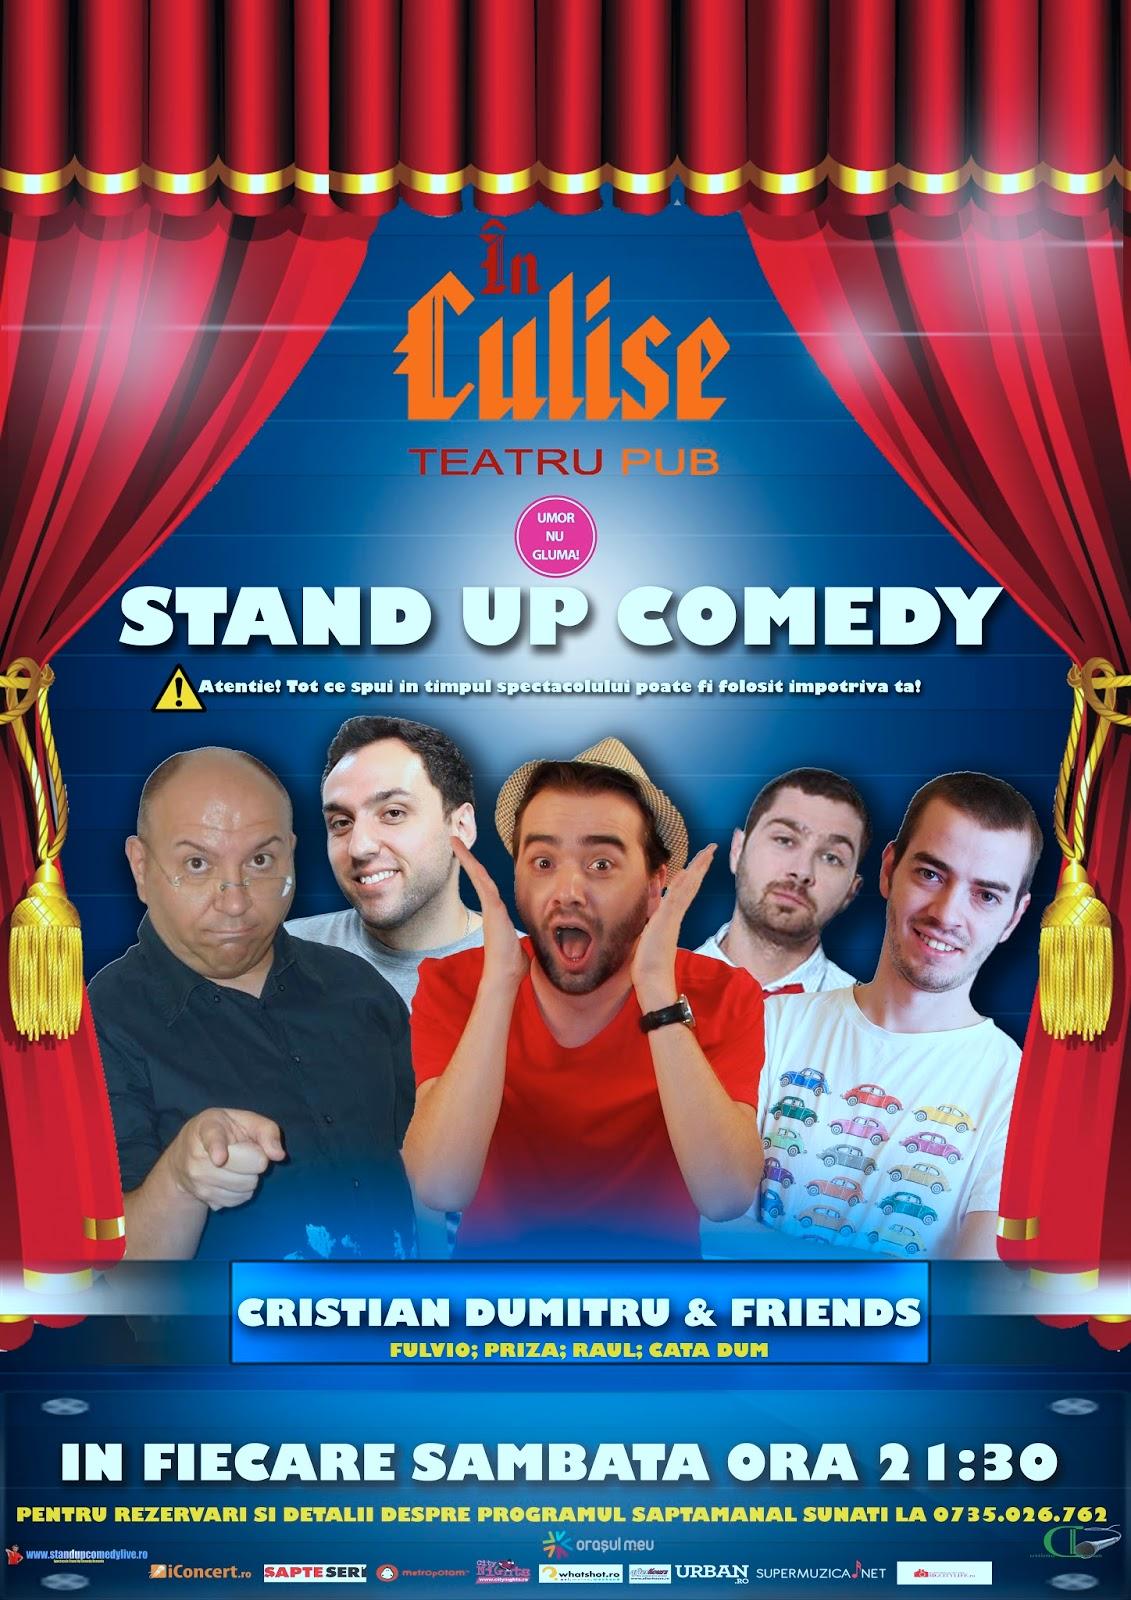 Sambata: Stand-Up Comedy Comedy Club Bucuresti